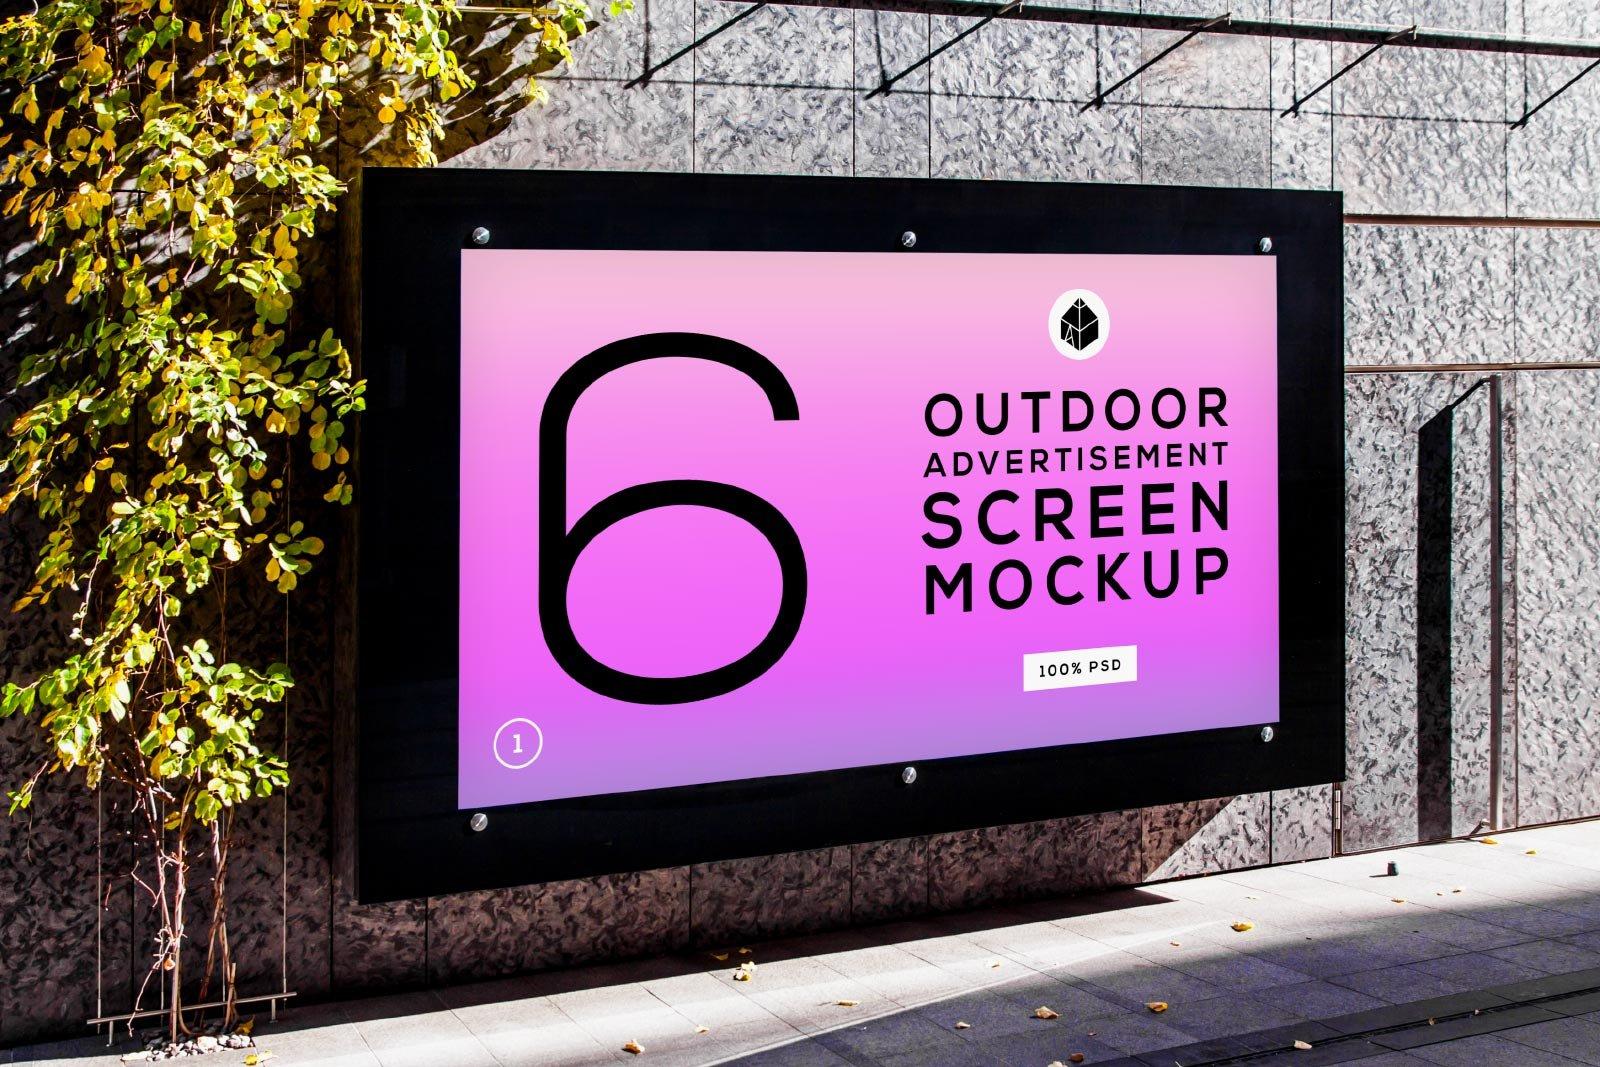 Outdoor Advertising Screen Mockups 4 Product Mockups